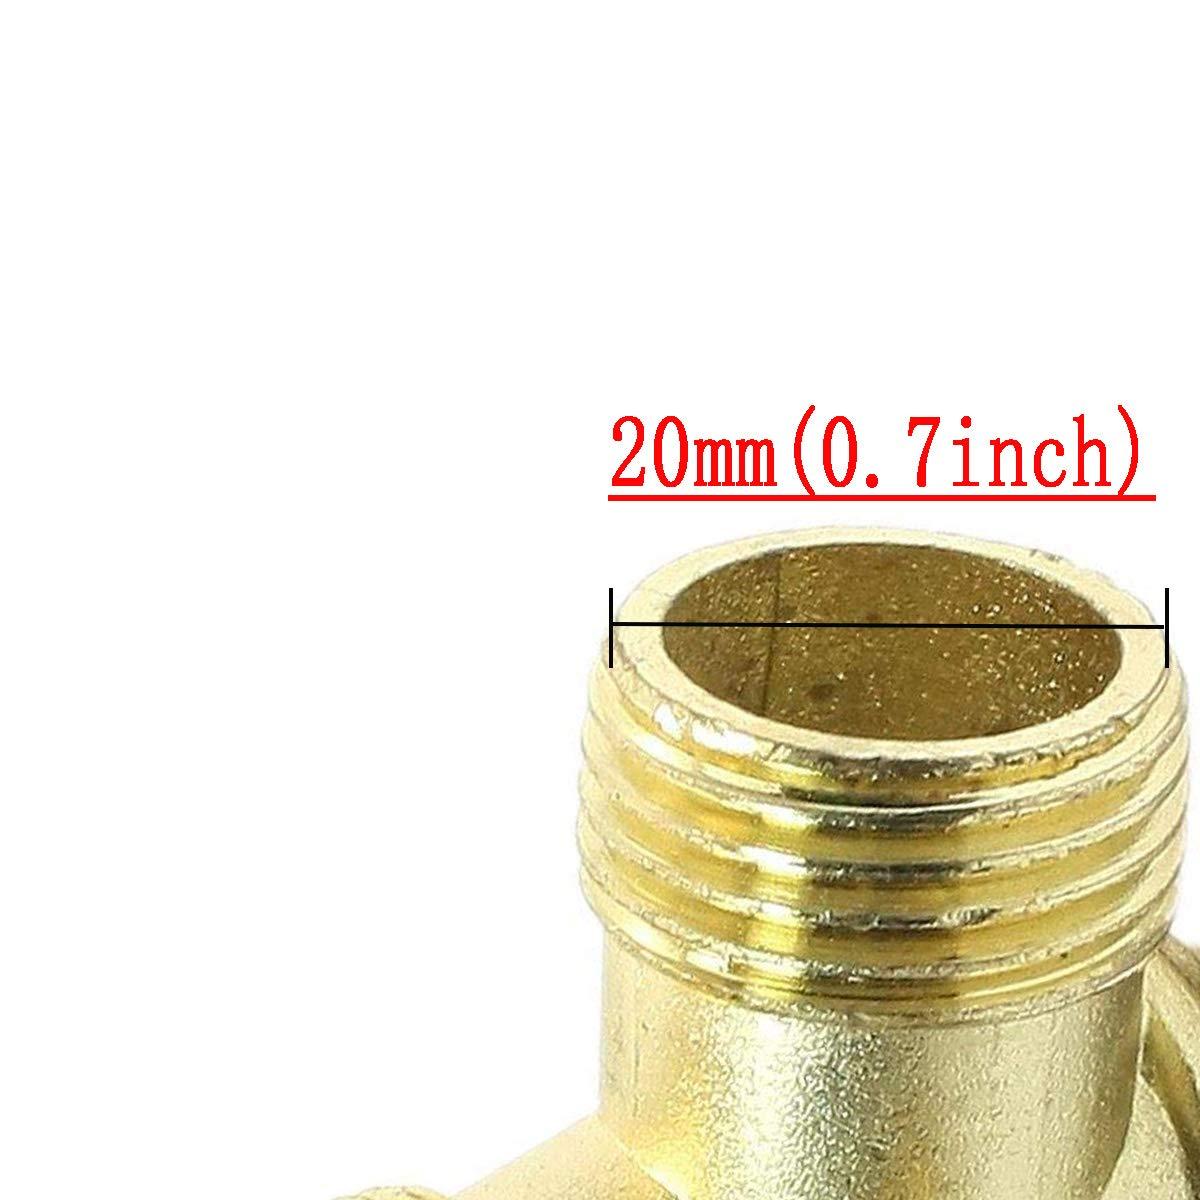 COMOK Male Thread Brass 90-Degree Left Connector Air Compressor Check Valve Spare Parts Gold Tone